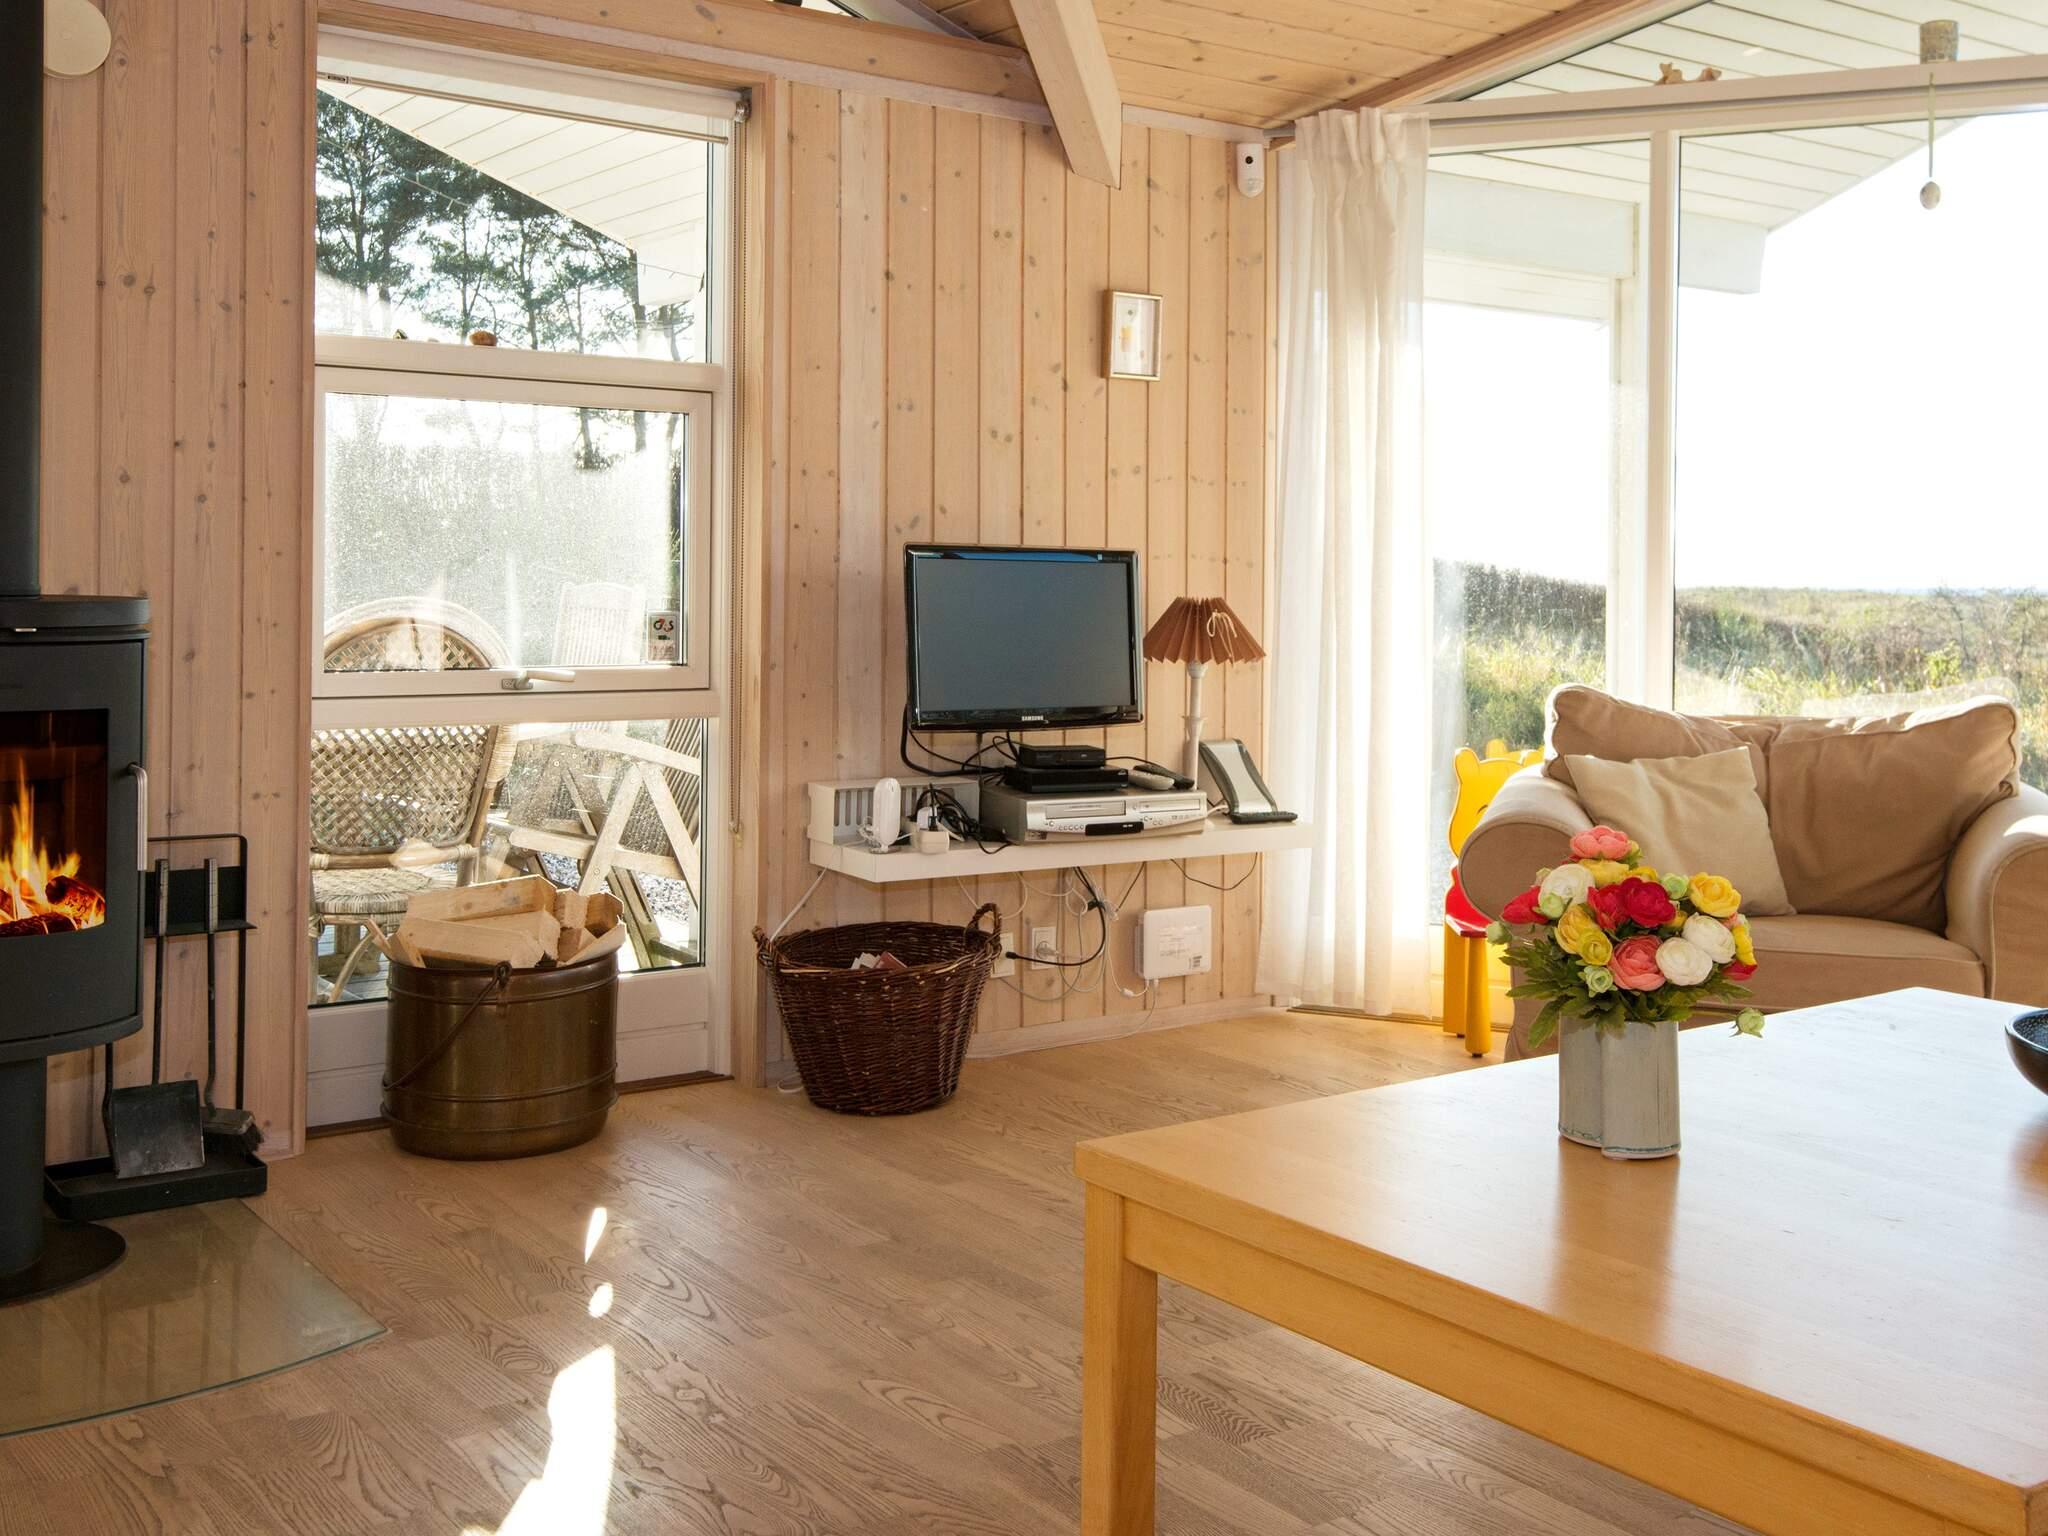 Maison de vacances Helgenæs (681779), Knebel, , Mer Baltique danoise, Danemark, image 3